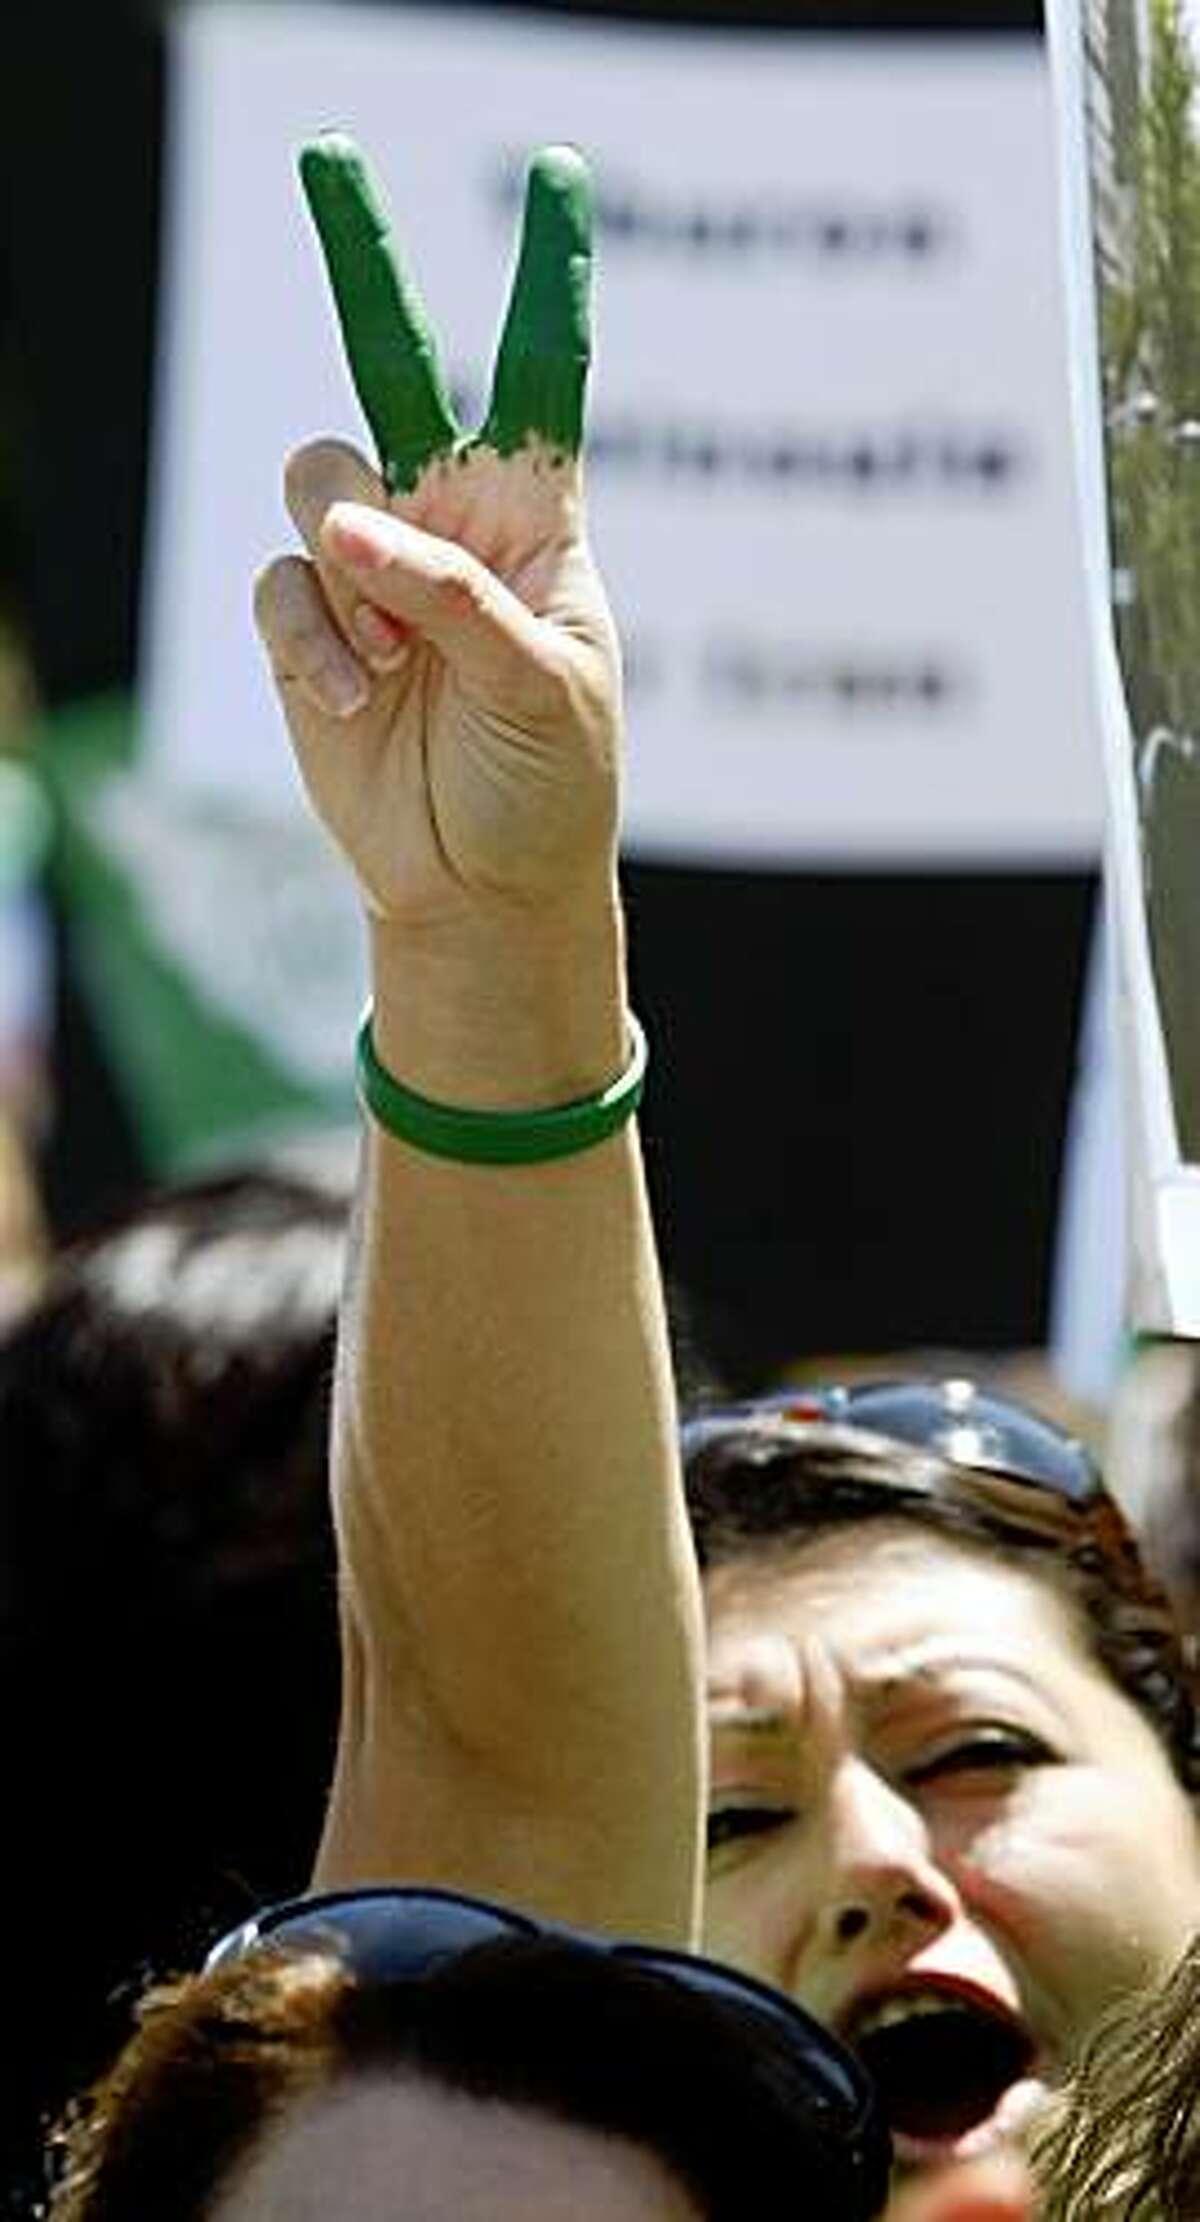 Gioli Assadi from Sacramento California joined several thousand fellow protestors at a